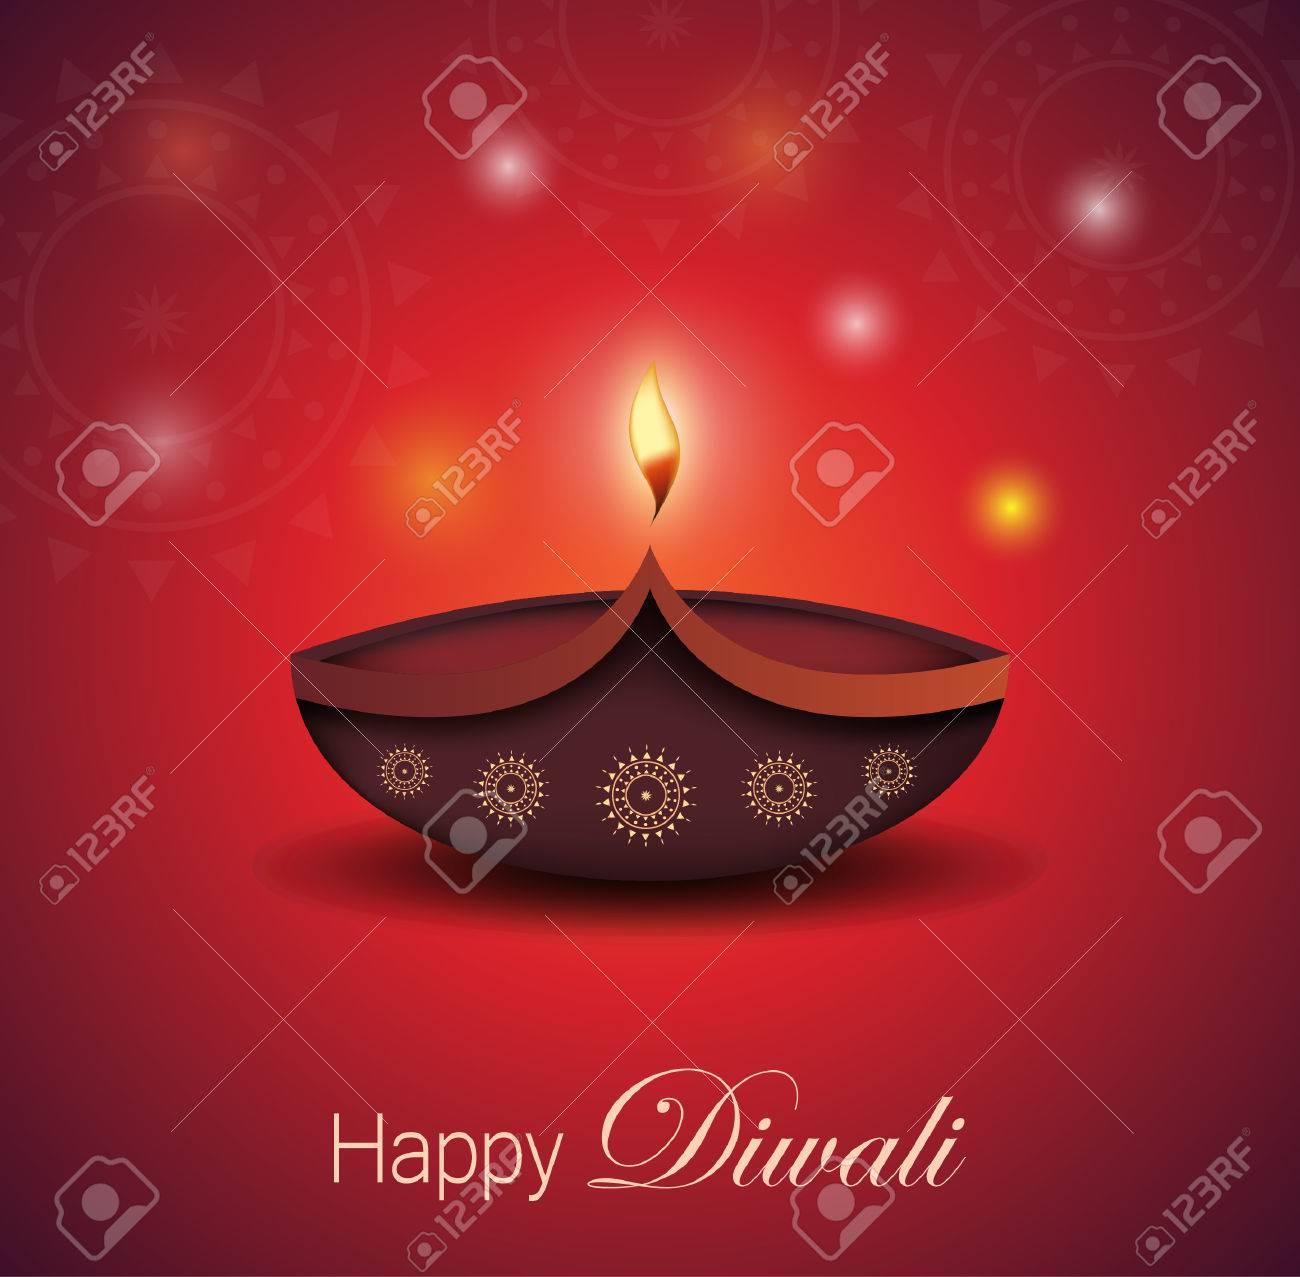 Diwali greeting card burning diya festival of lights vector diwali greeting card burning diya festival of lights vector illustration stock vector m4hsunfo